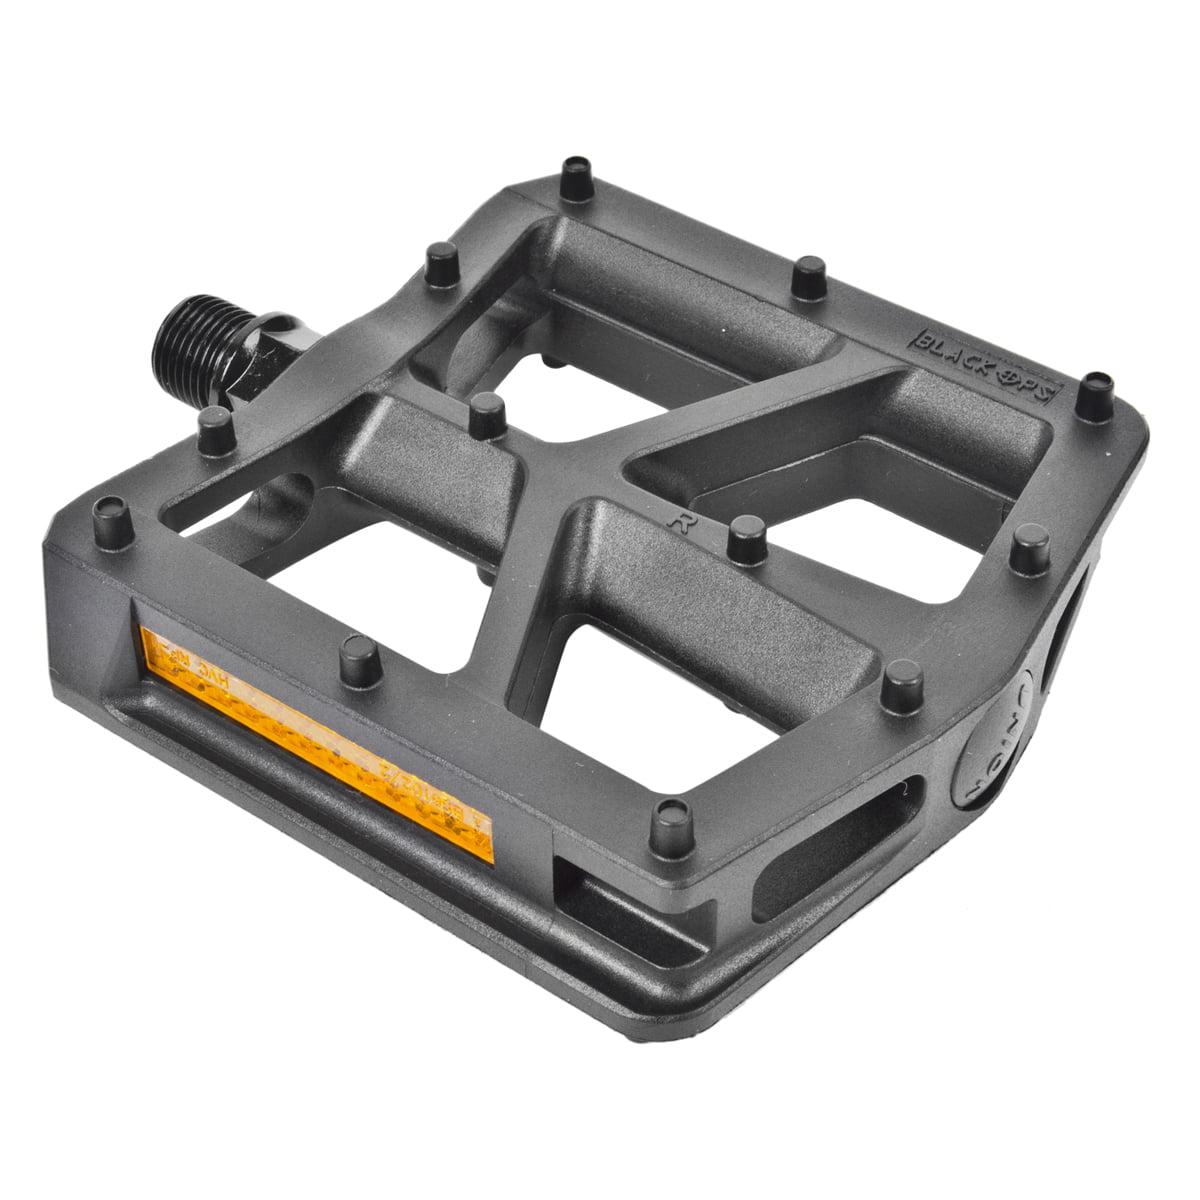 Black Ops Pivot Pro Seatpost Seatpost Bk-ops Pivot Pro 27.2x135al Bk